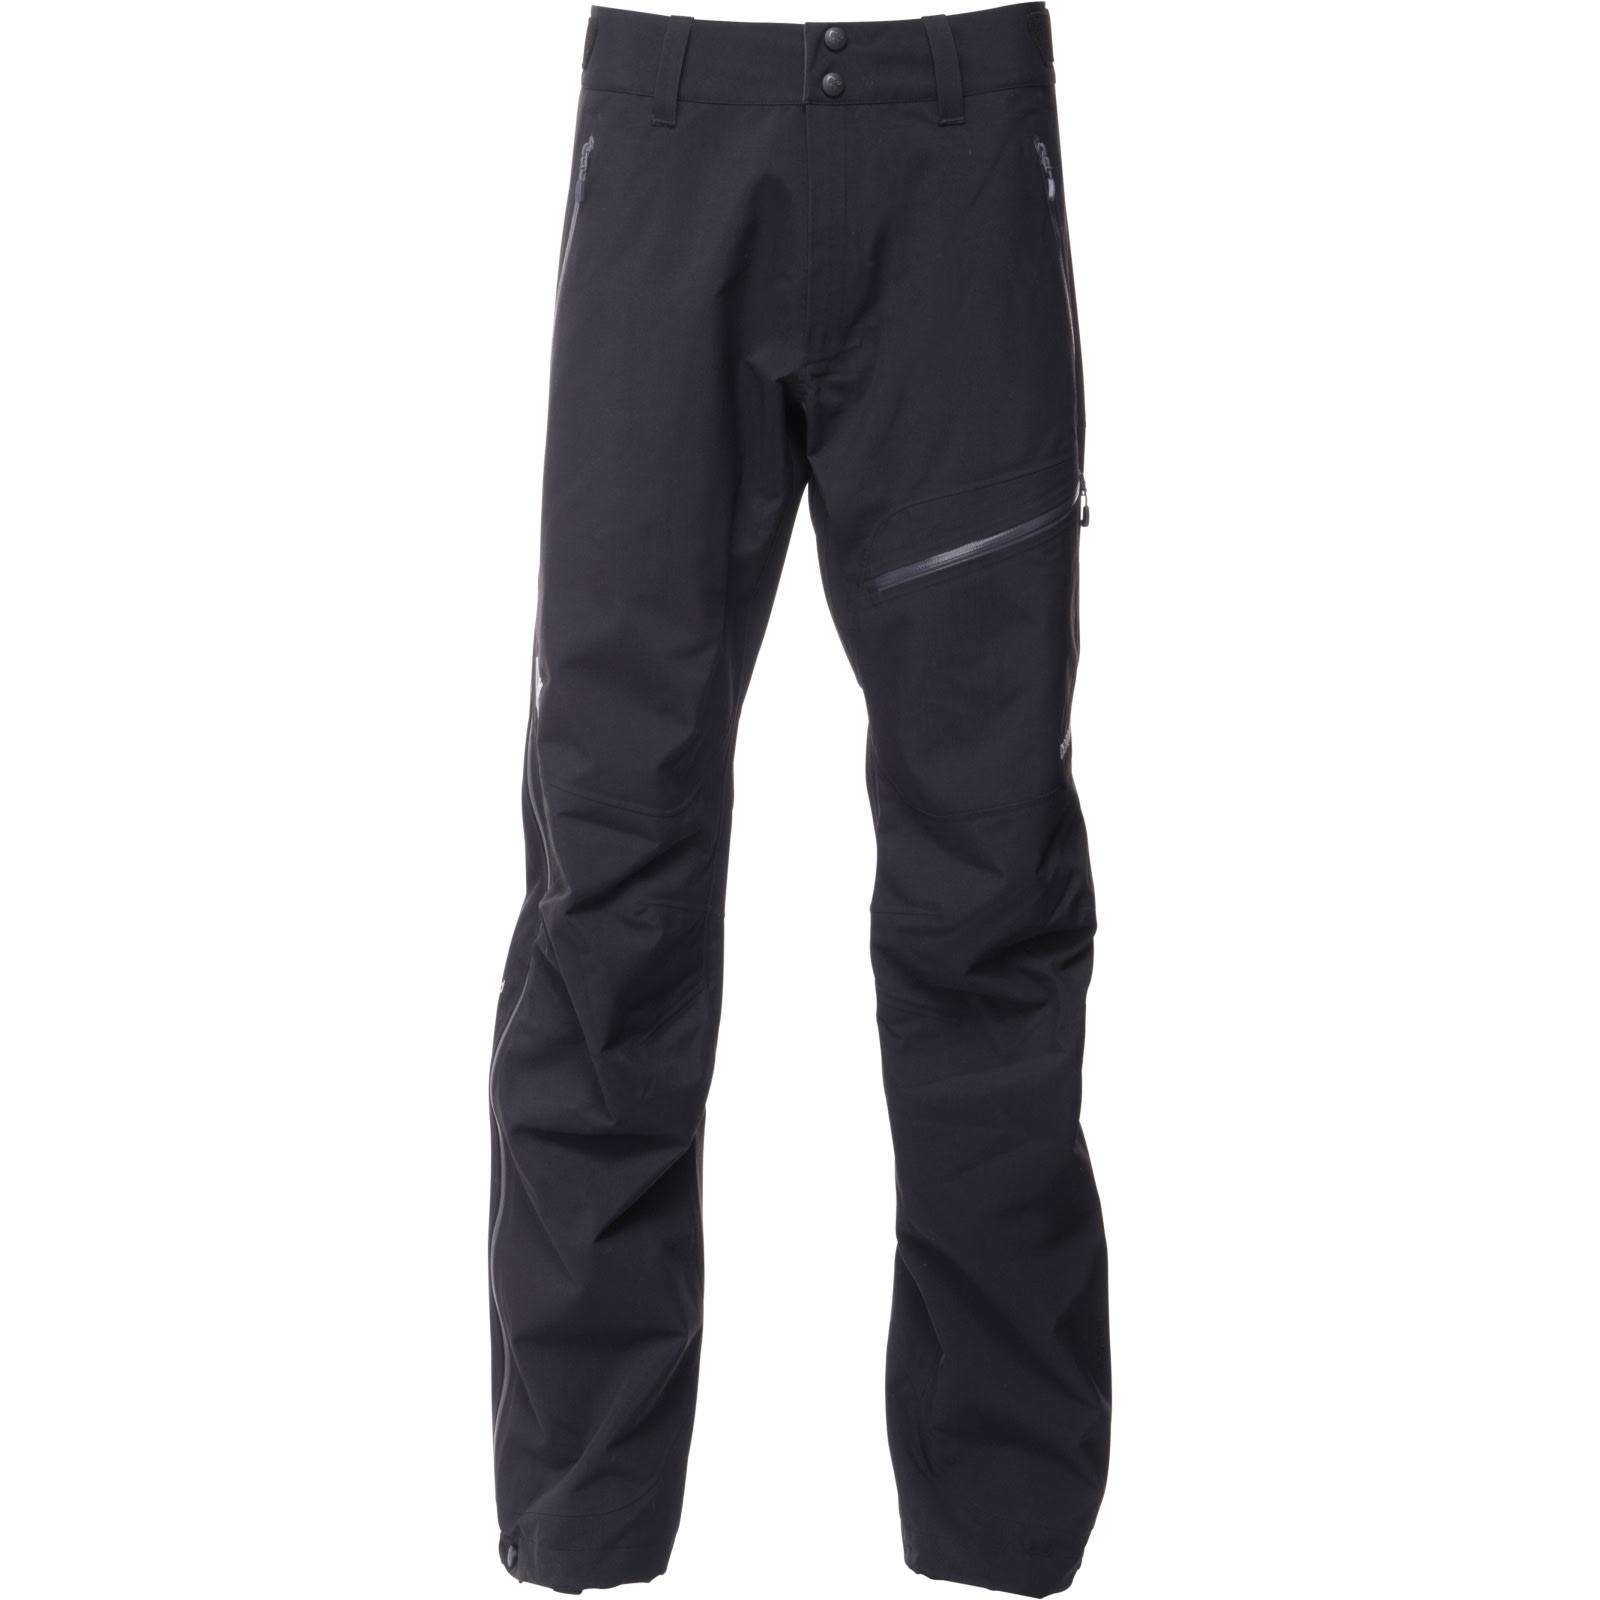 Kjøp Norrøna Bitihorn Dri3 Pants Women's fra Outnorth